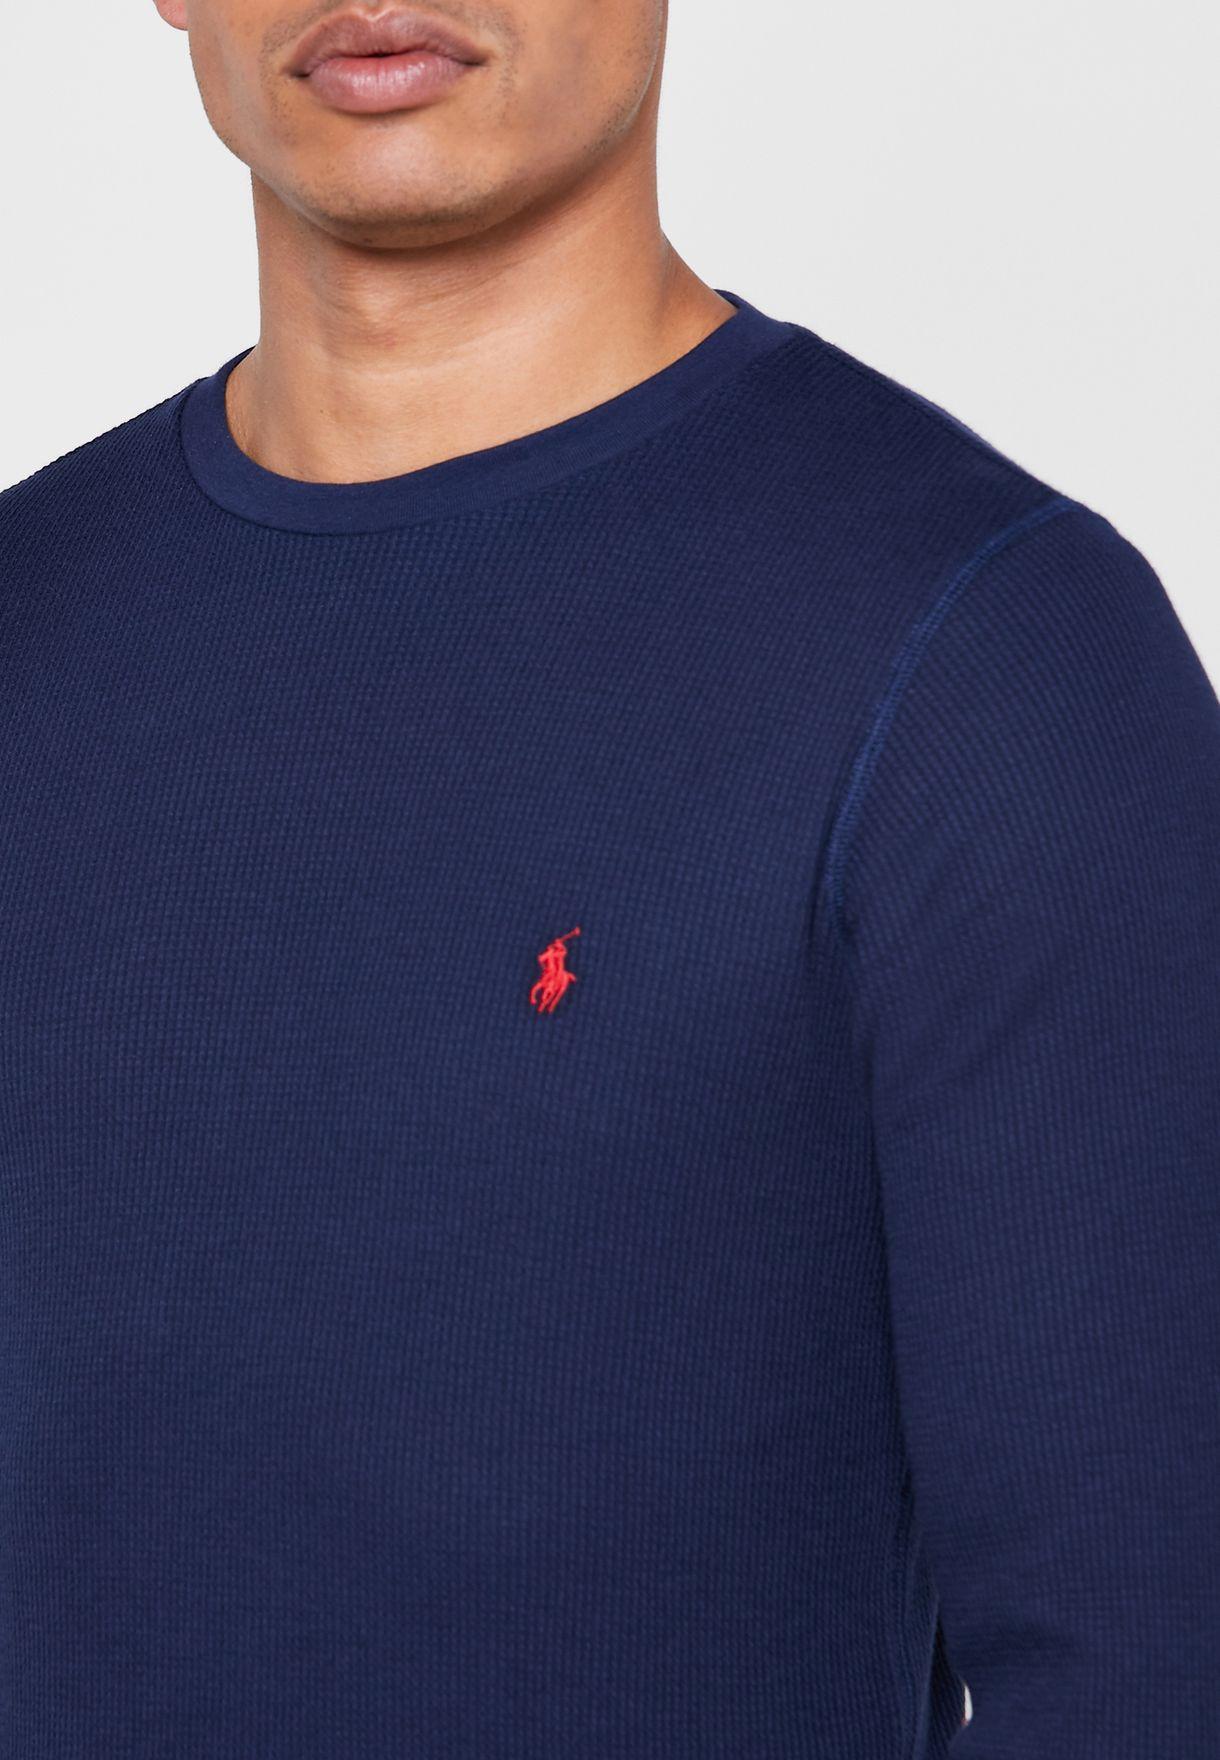 Ribbed Crew Neck T-Shirt